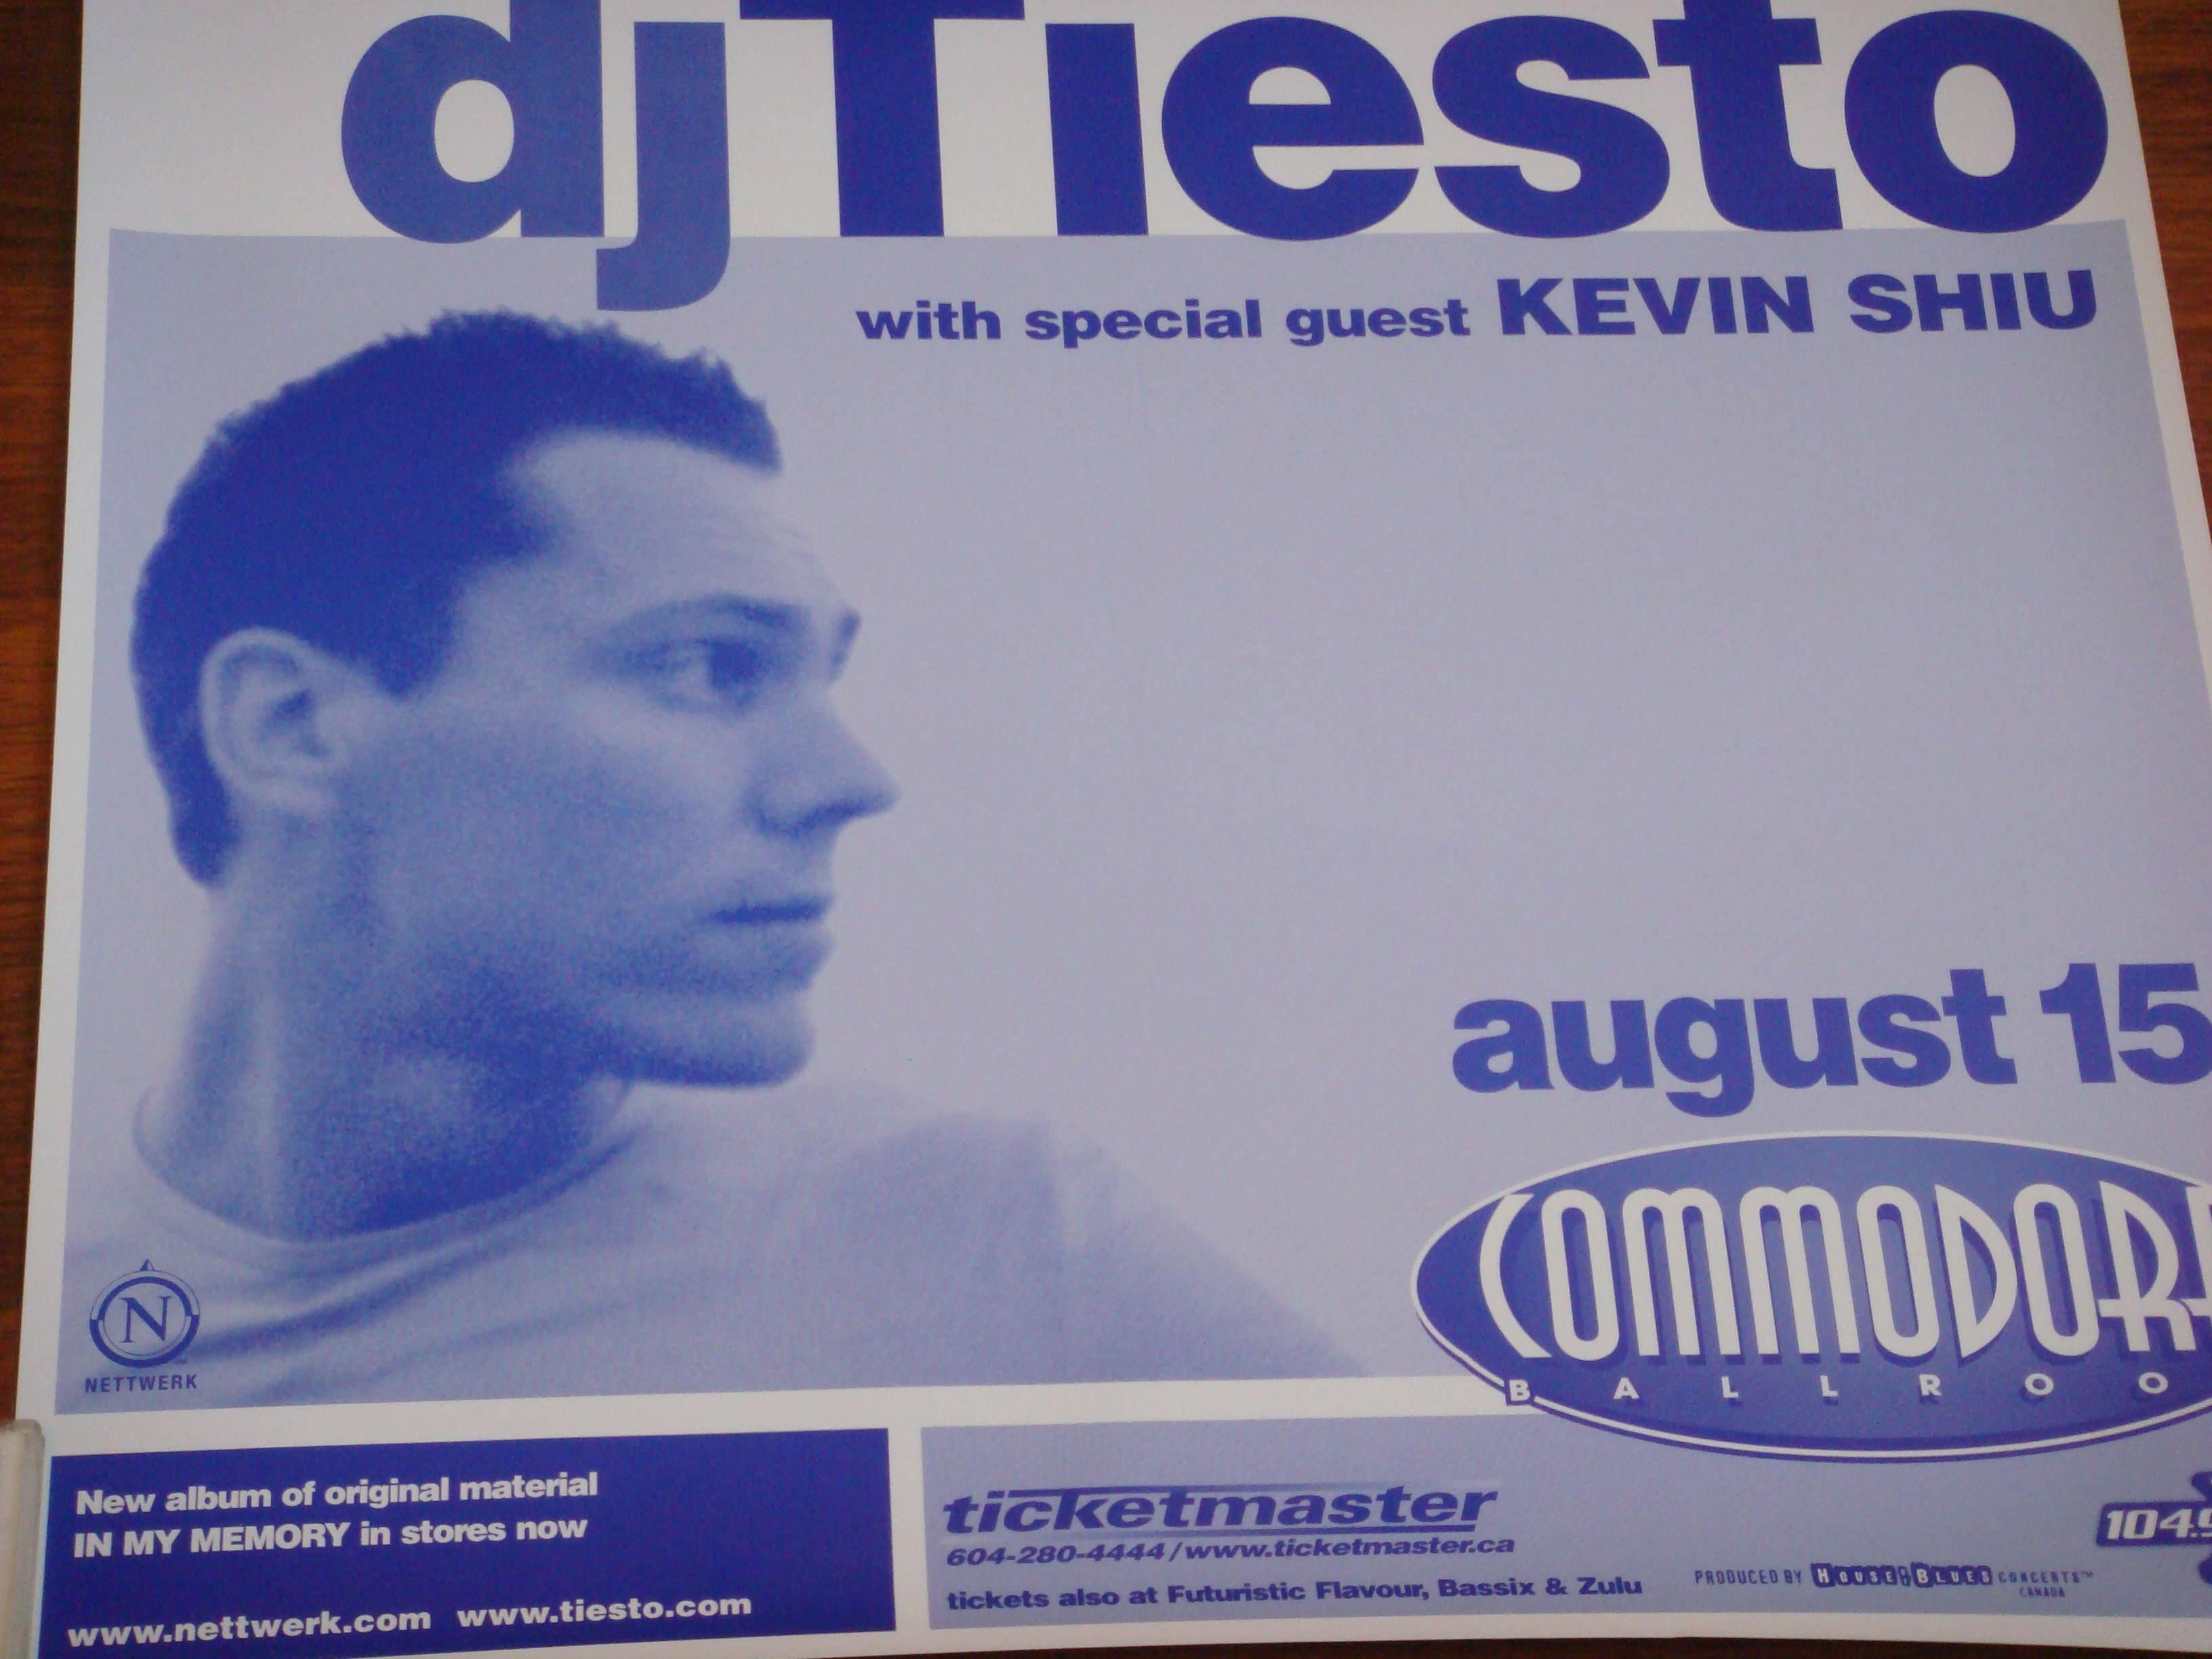 Dj Tiesto live at Commodore Ballroom 15 August 2002 Poster